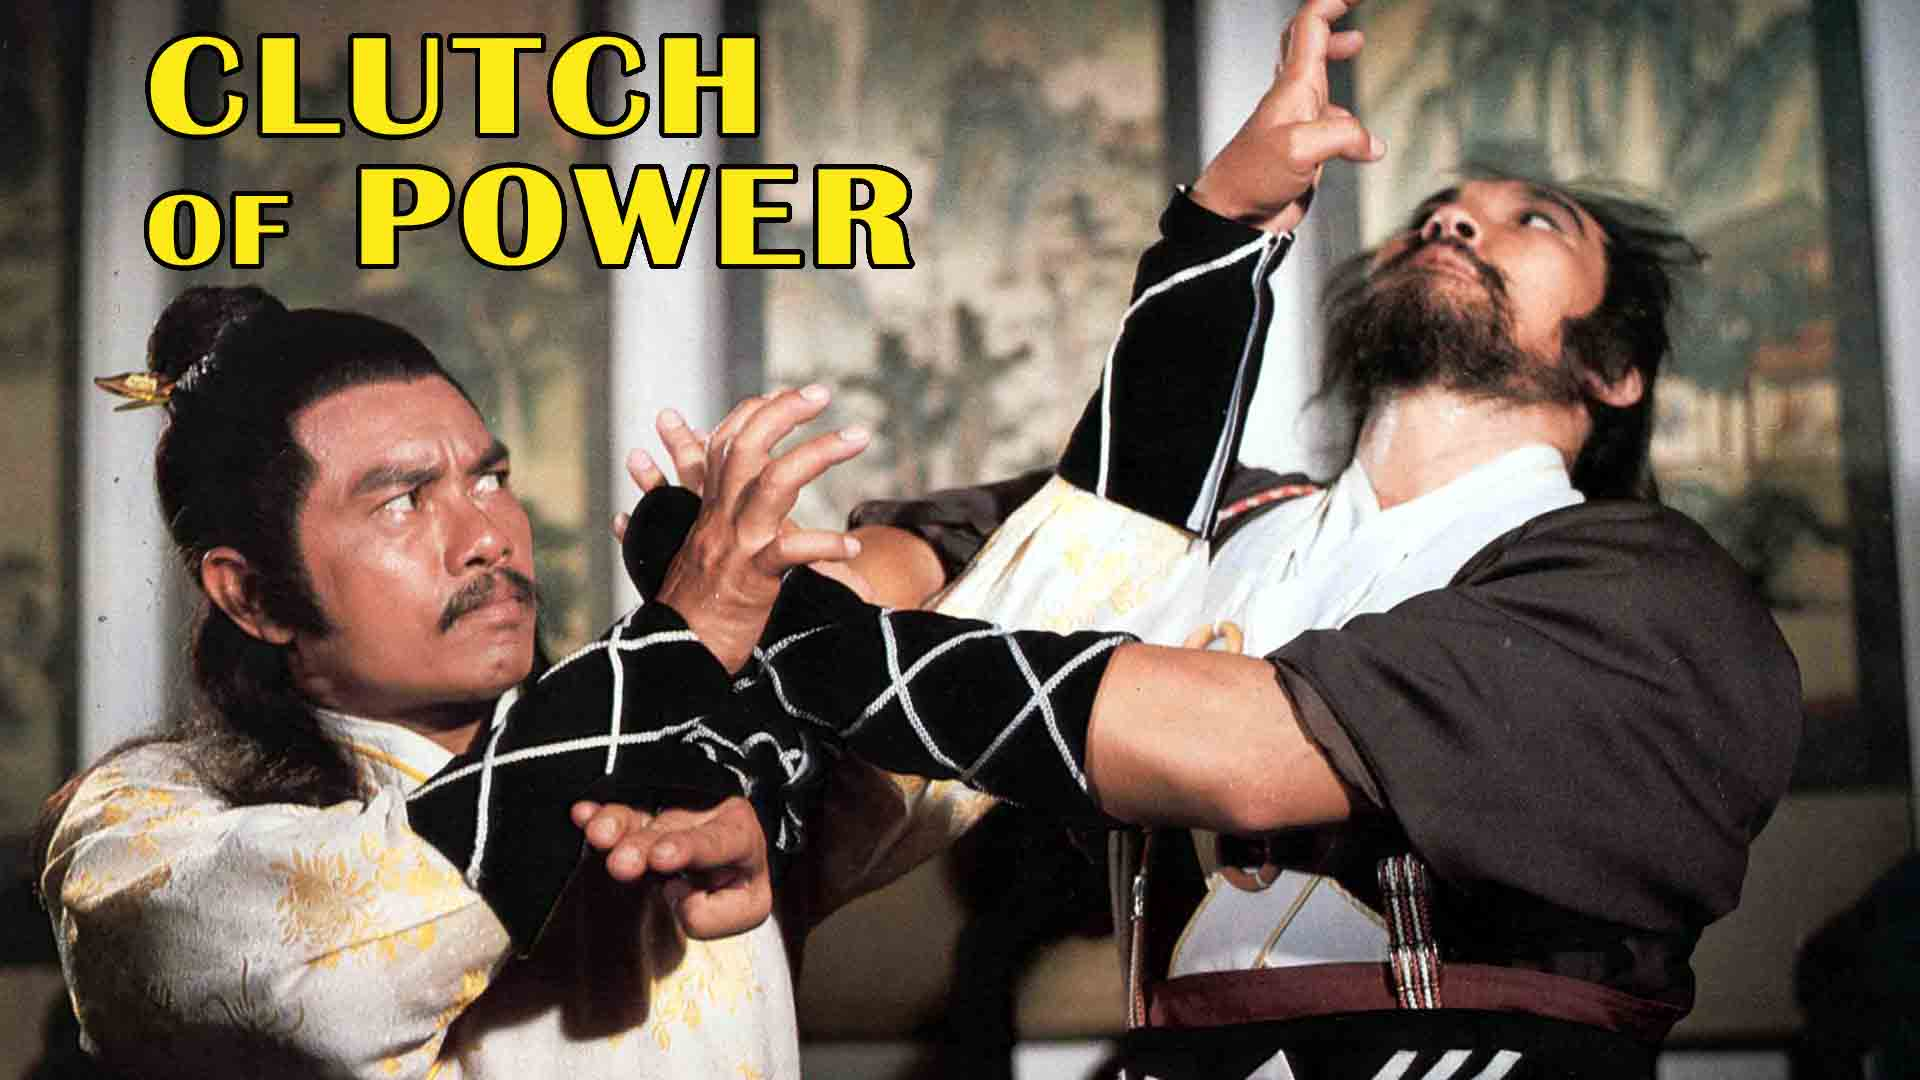 Clutch Of Power